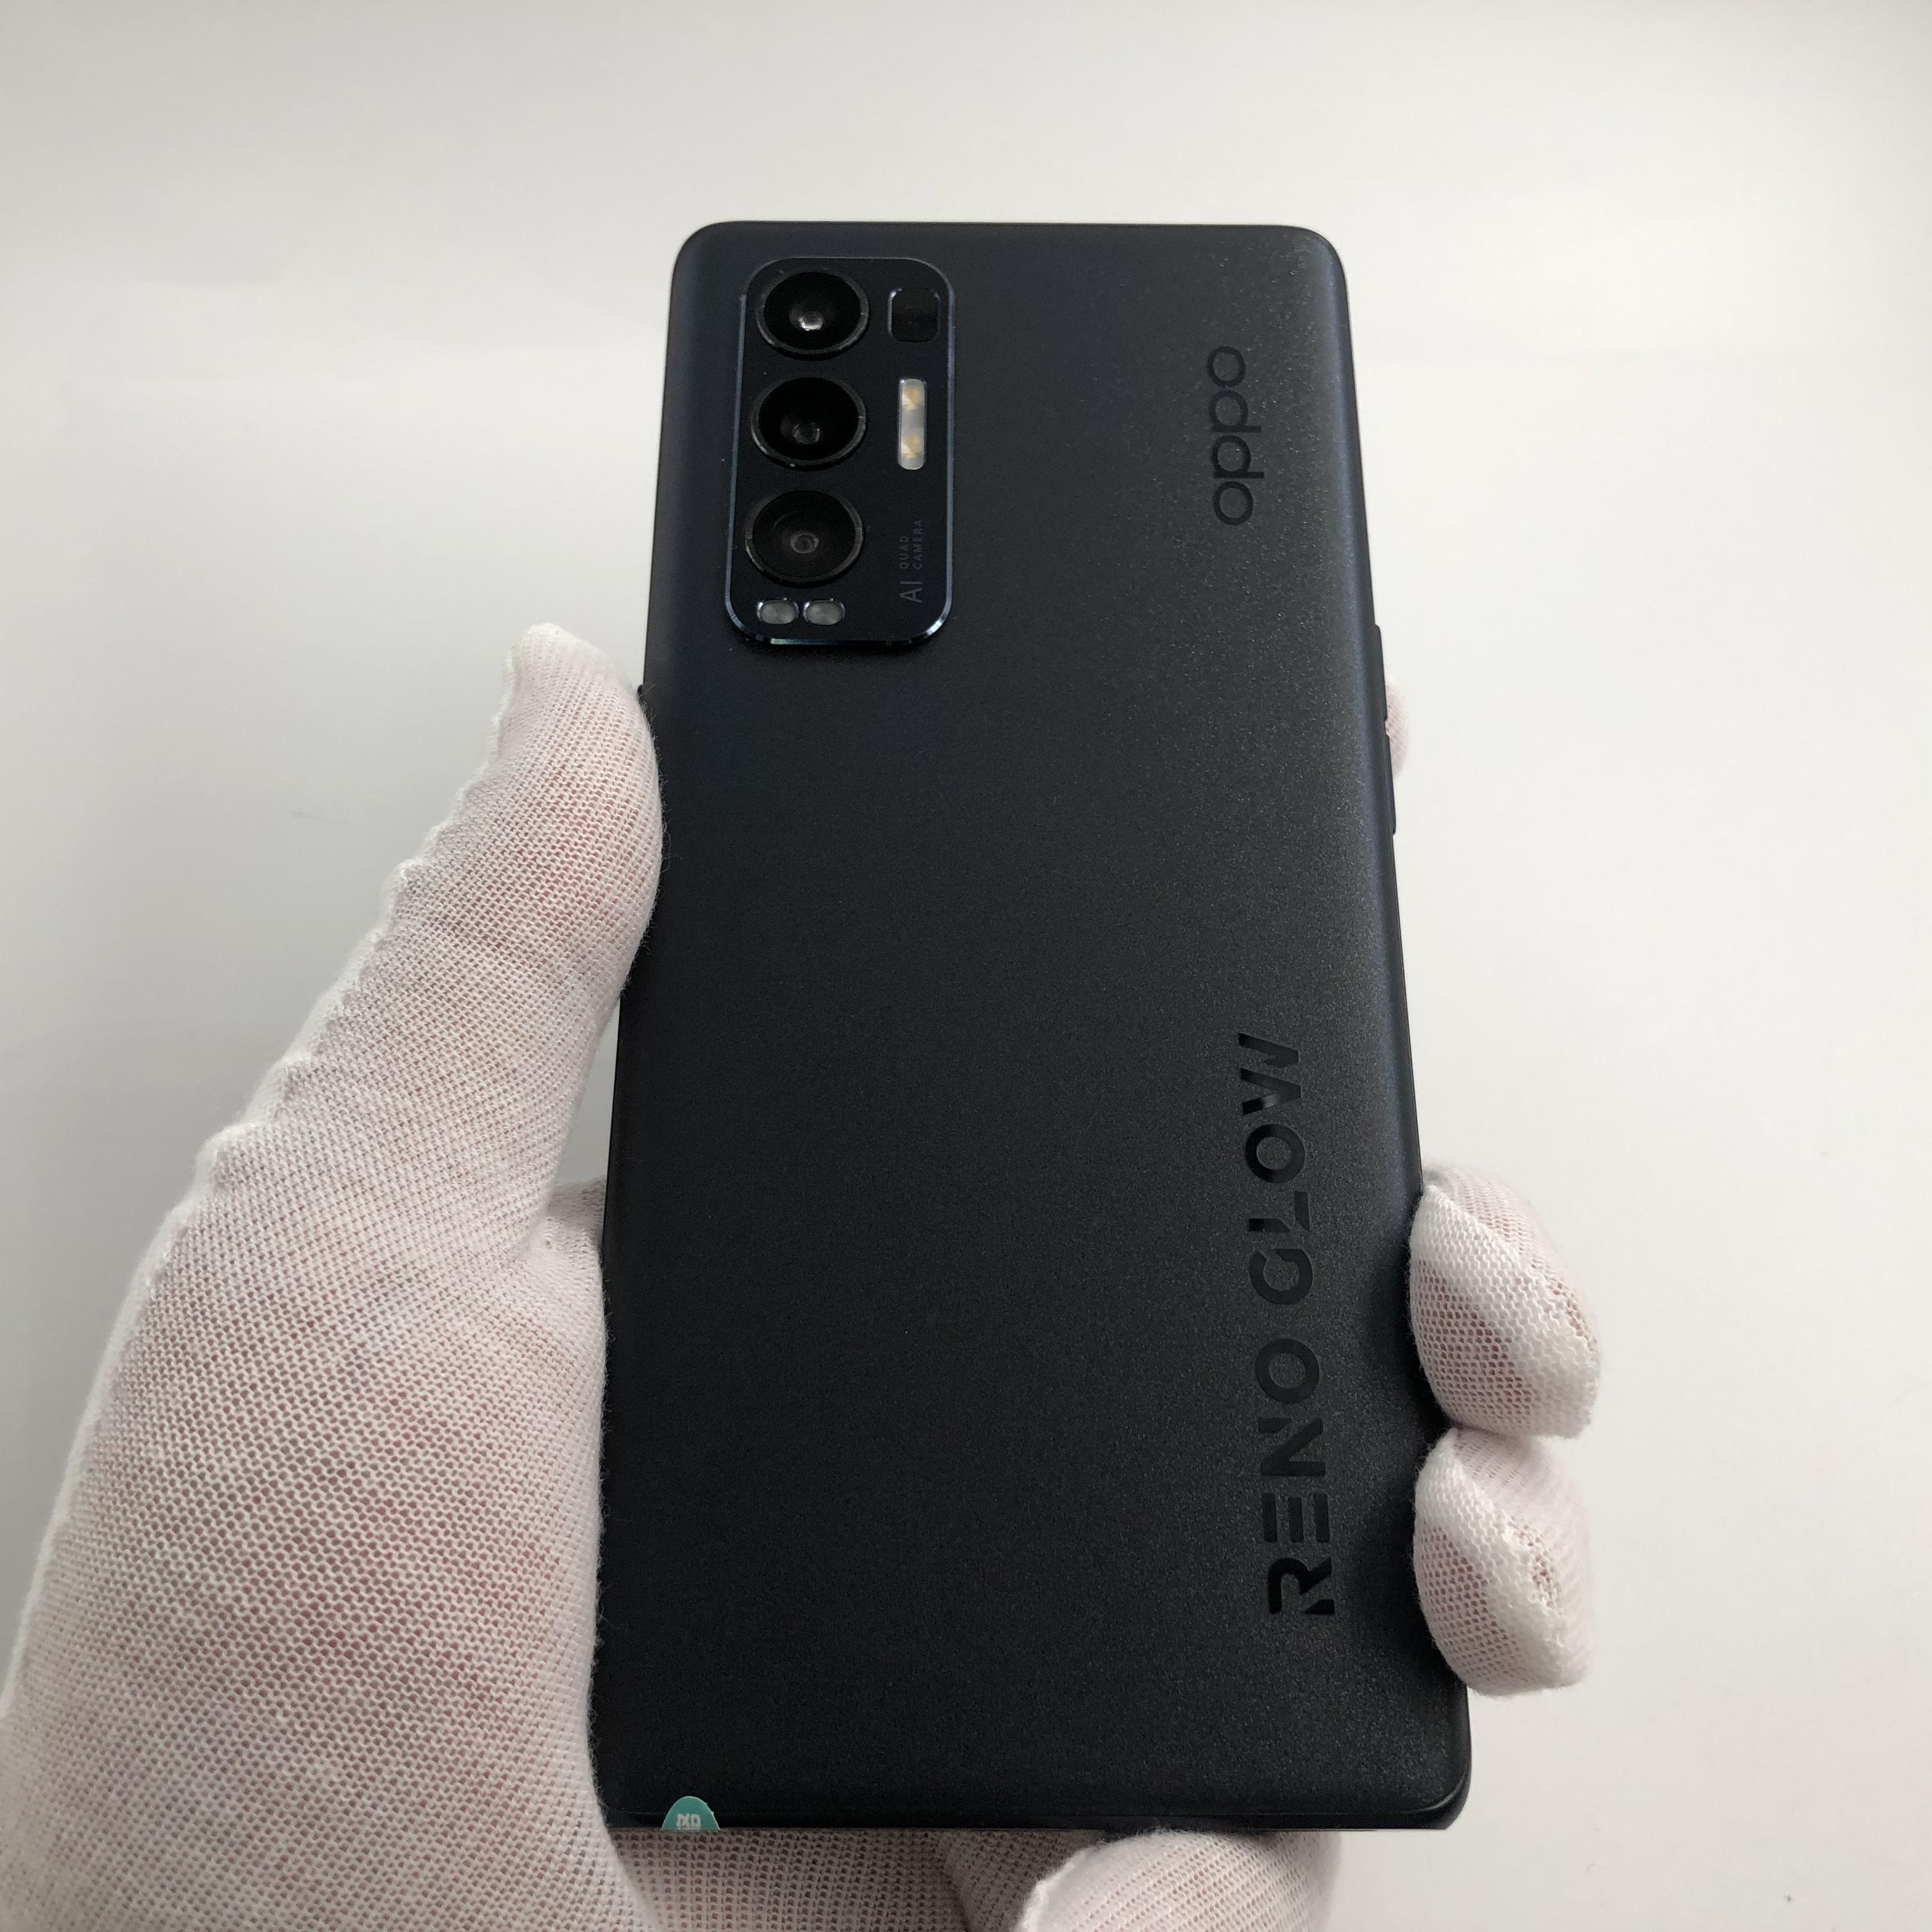 oppo【Reno5 Pro+】5G全网通 浮光夜影 8G/128G 国行 99新